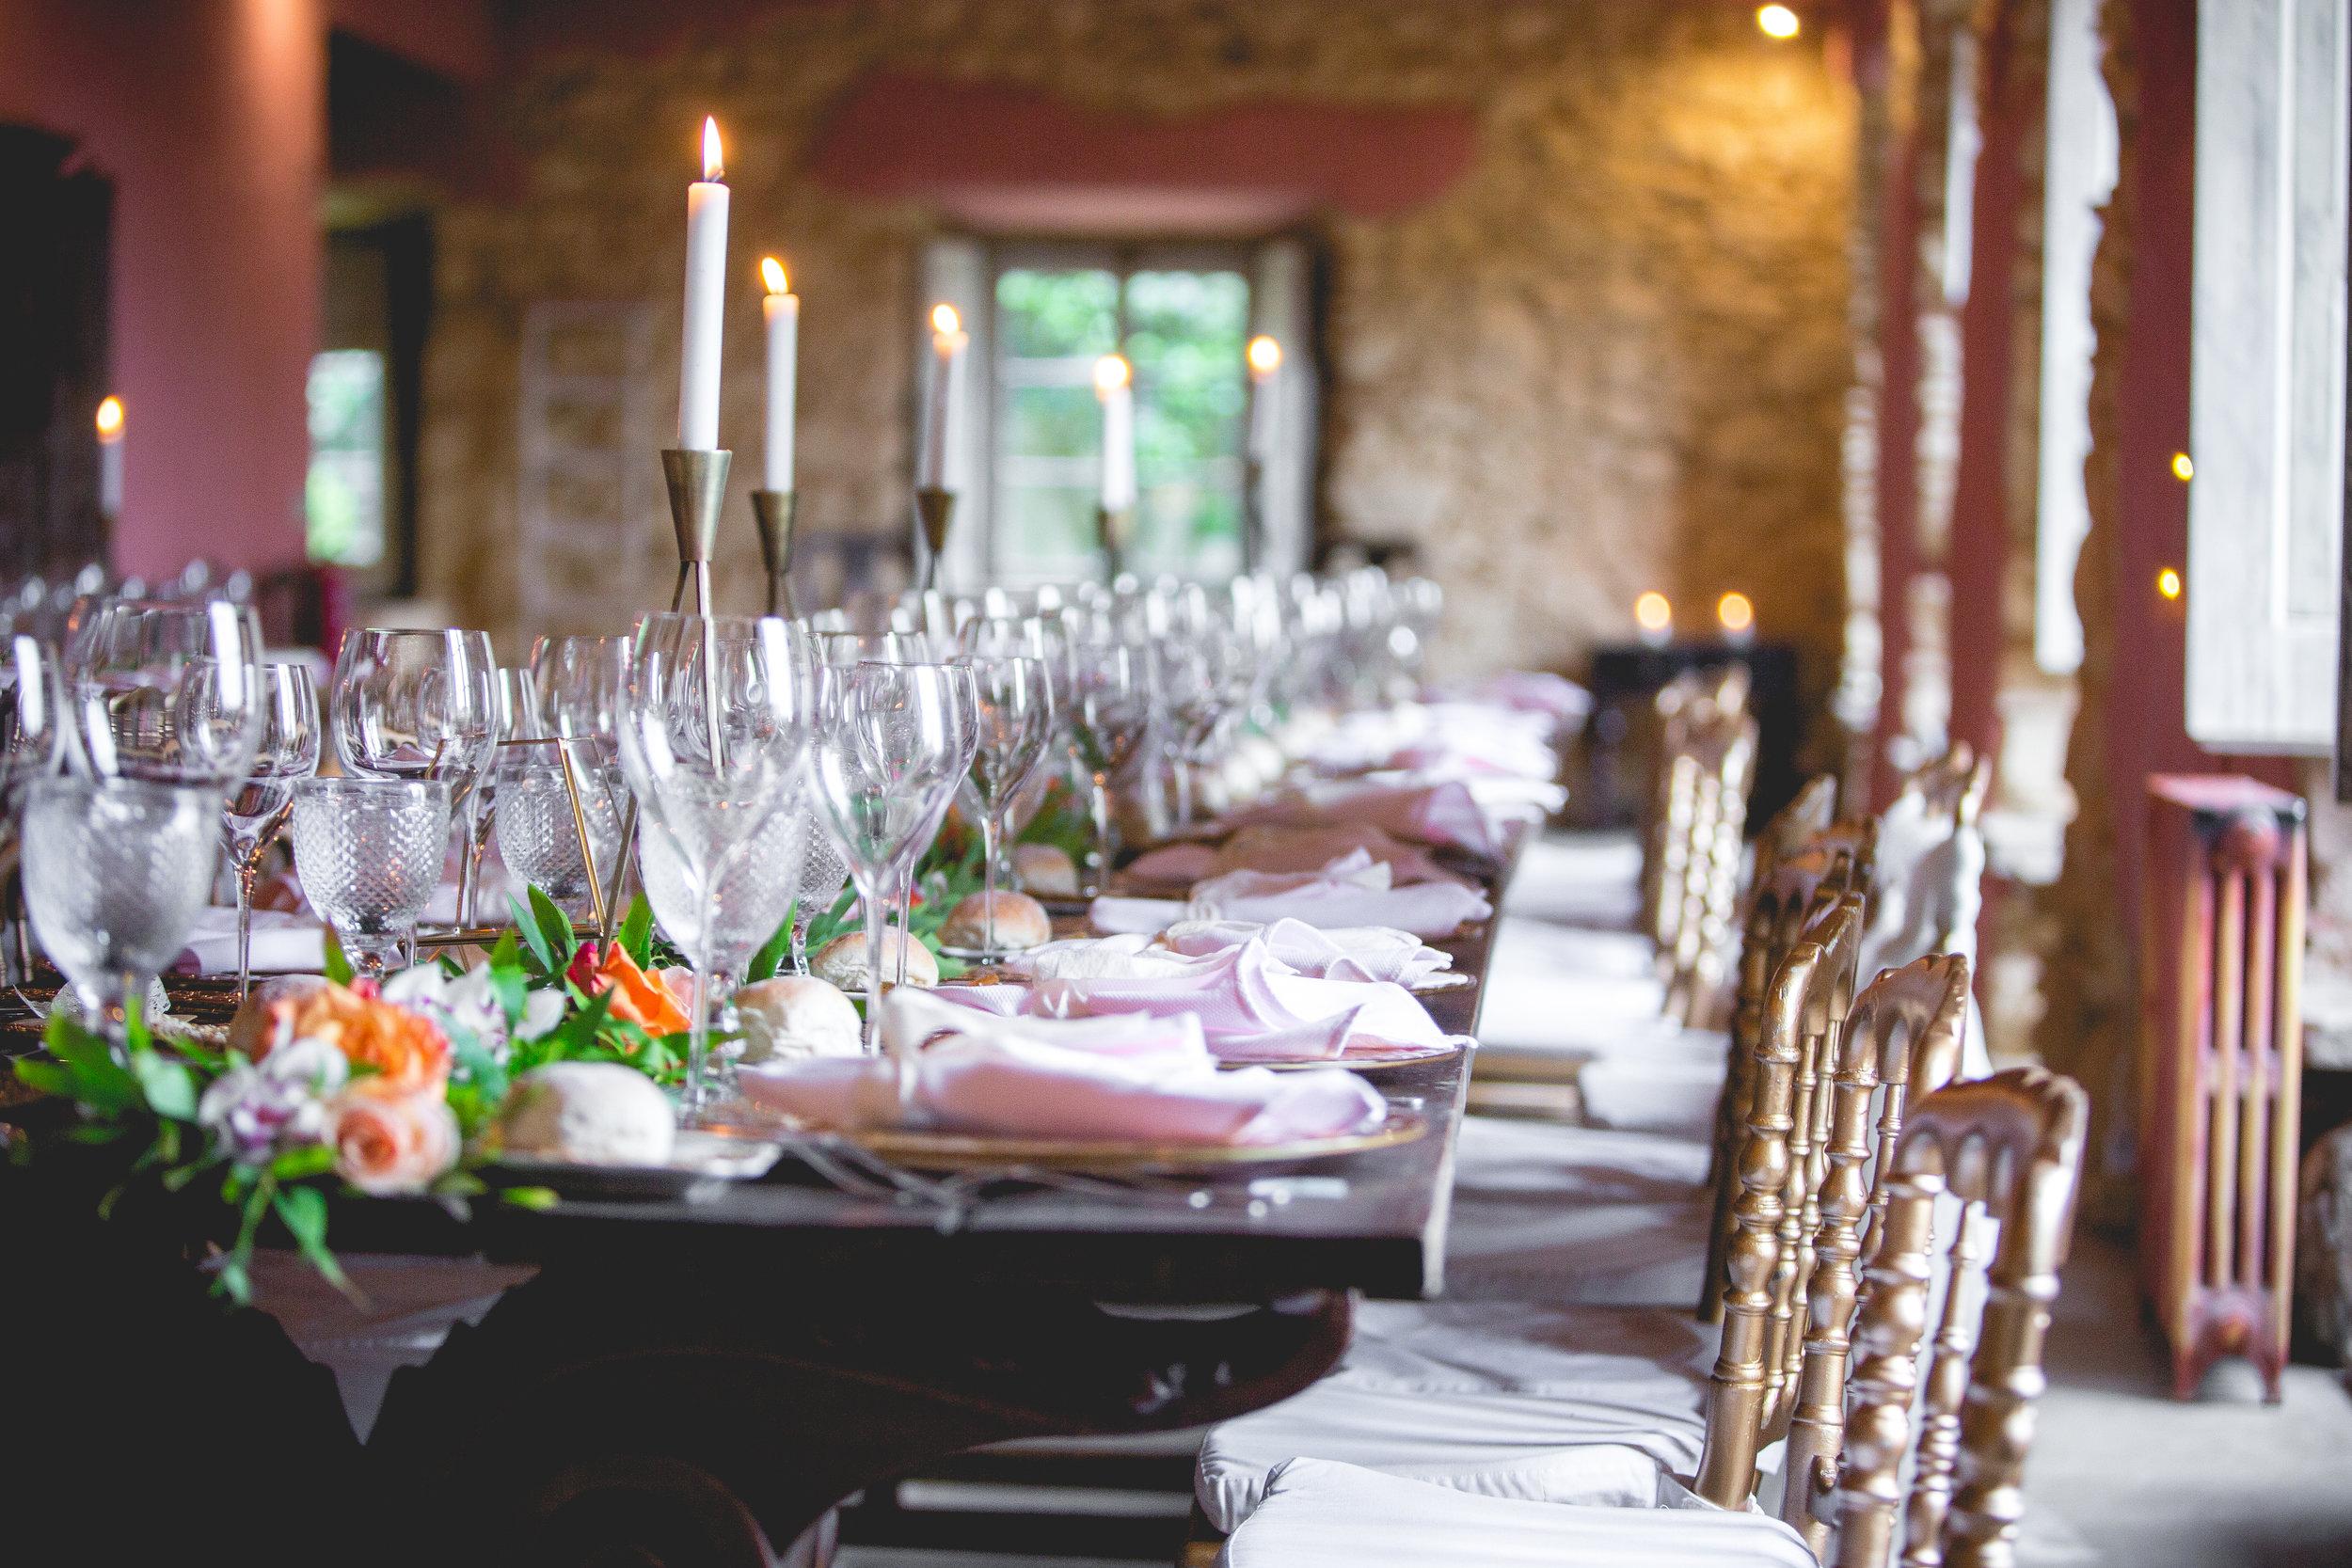 The Quinta Portugal Destination Wedding Venue